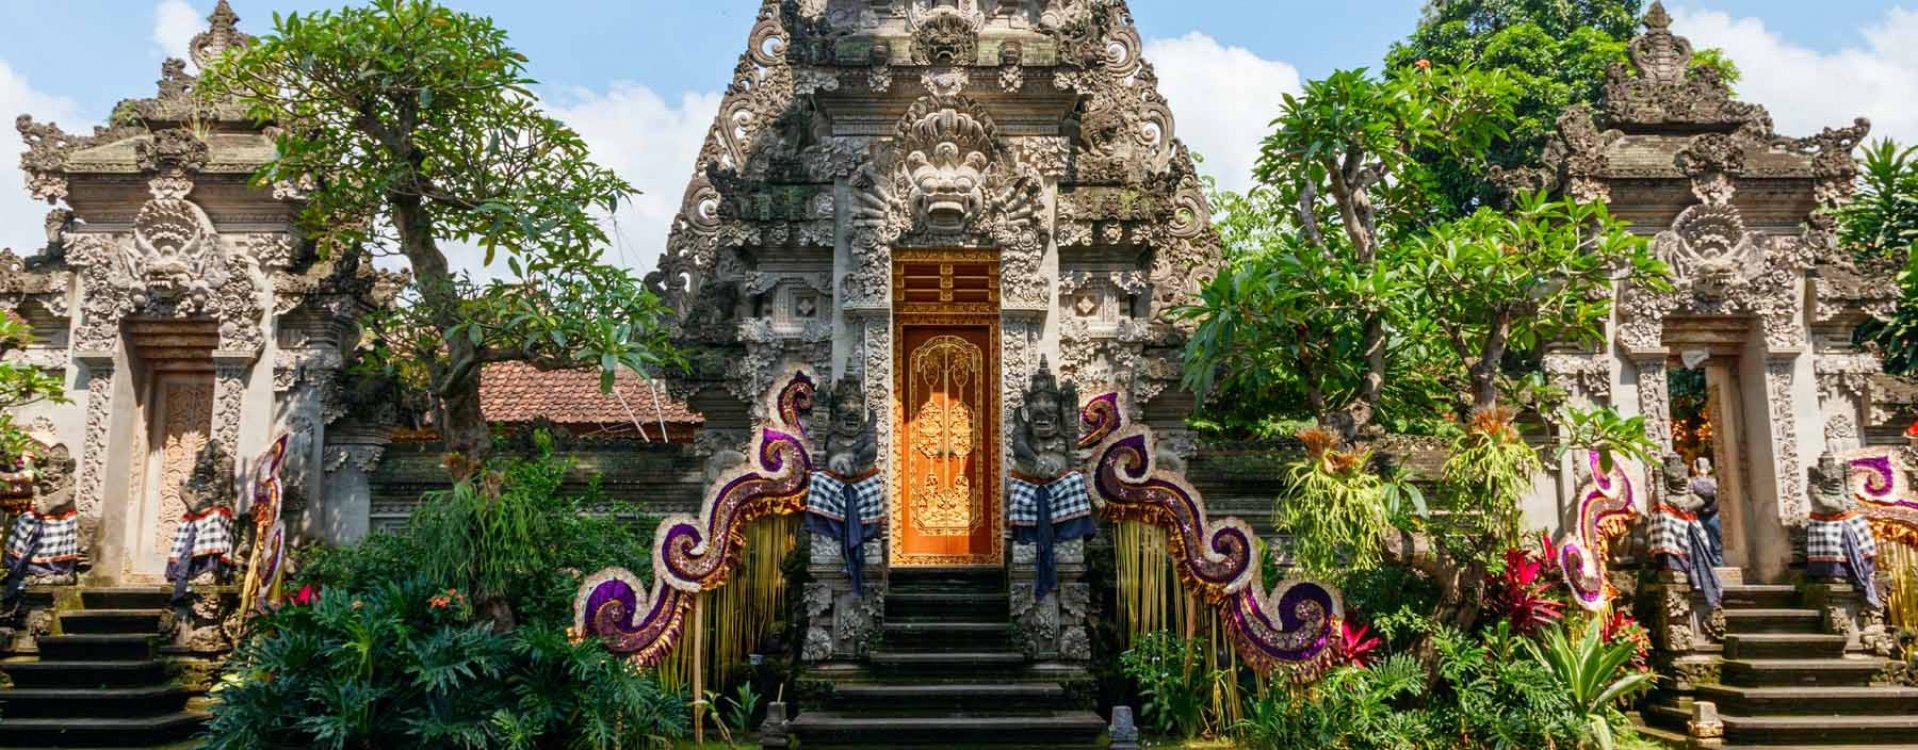 Hindoe tempel op Bali